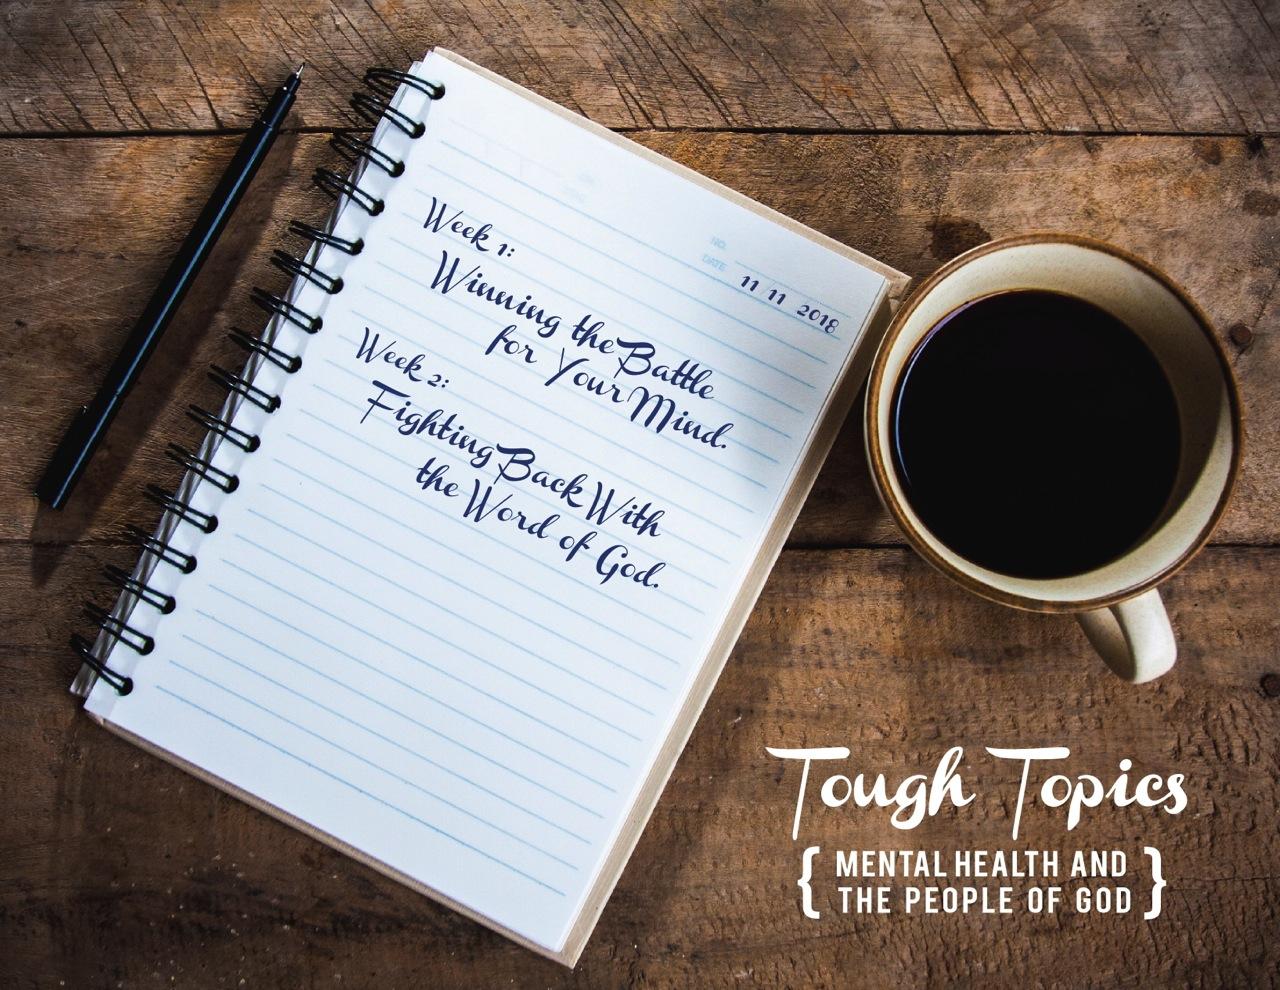 Tough Topics PPT Cover Slide_Week 2.jpg